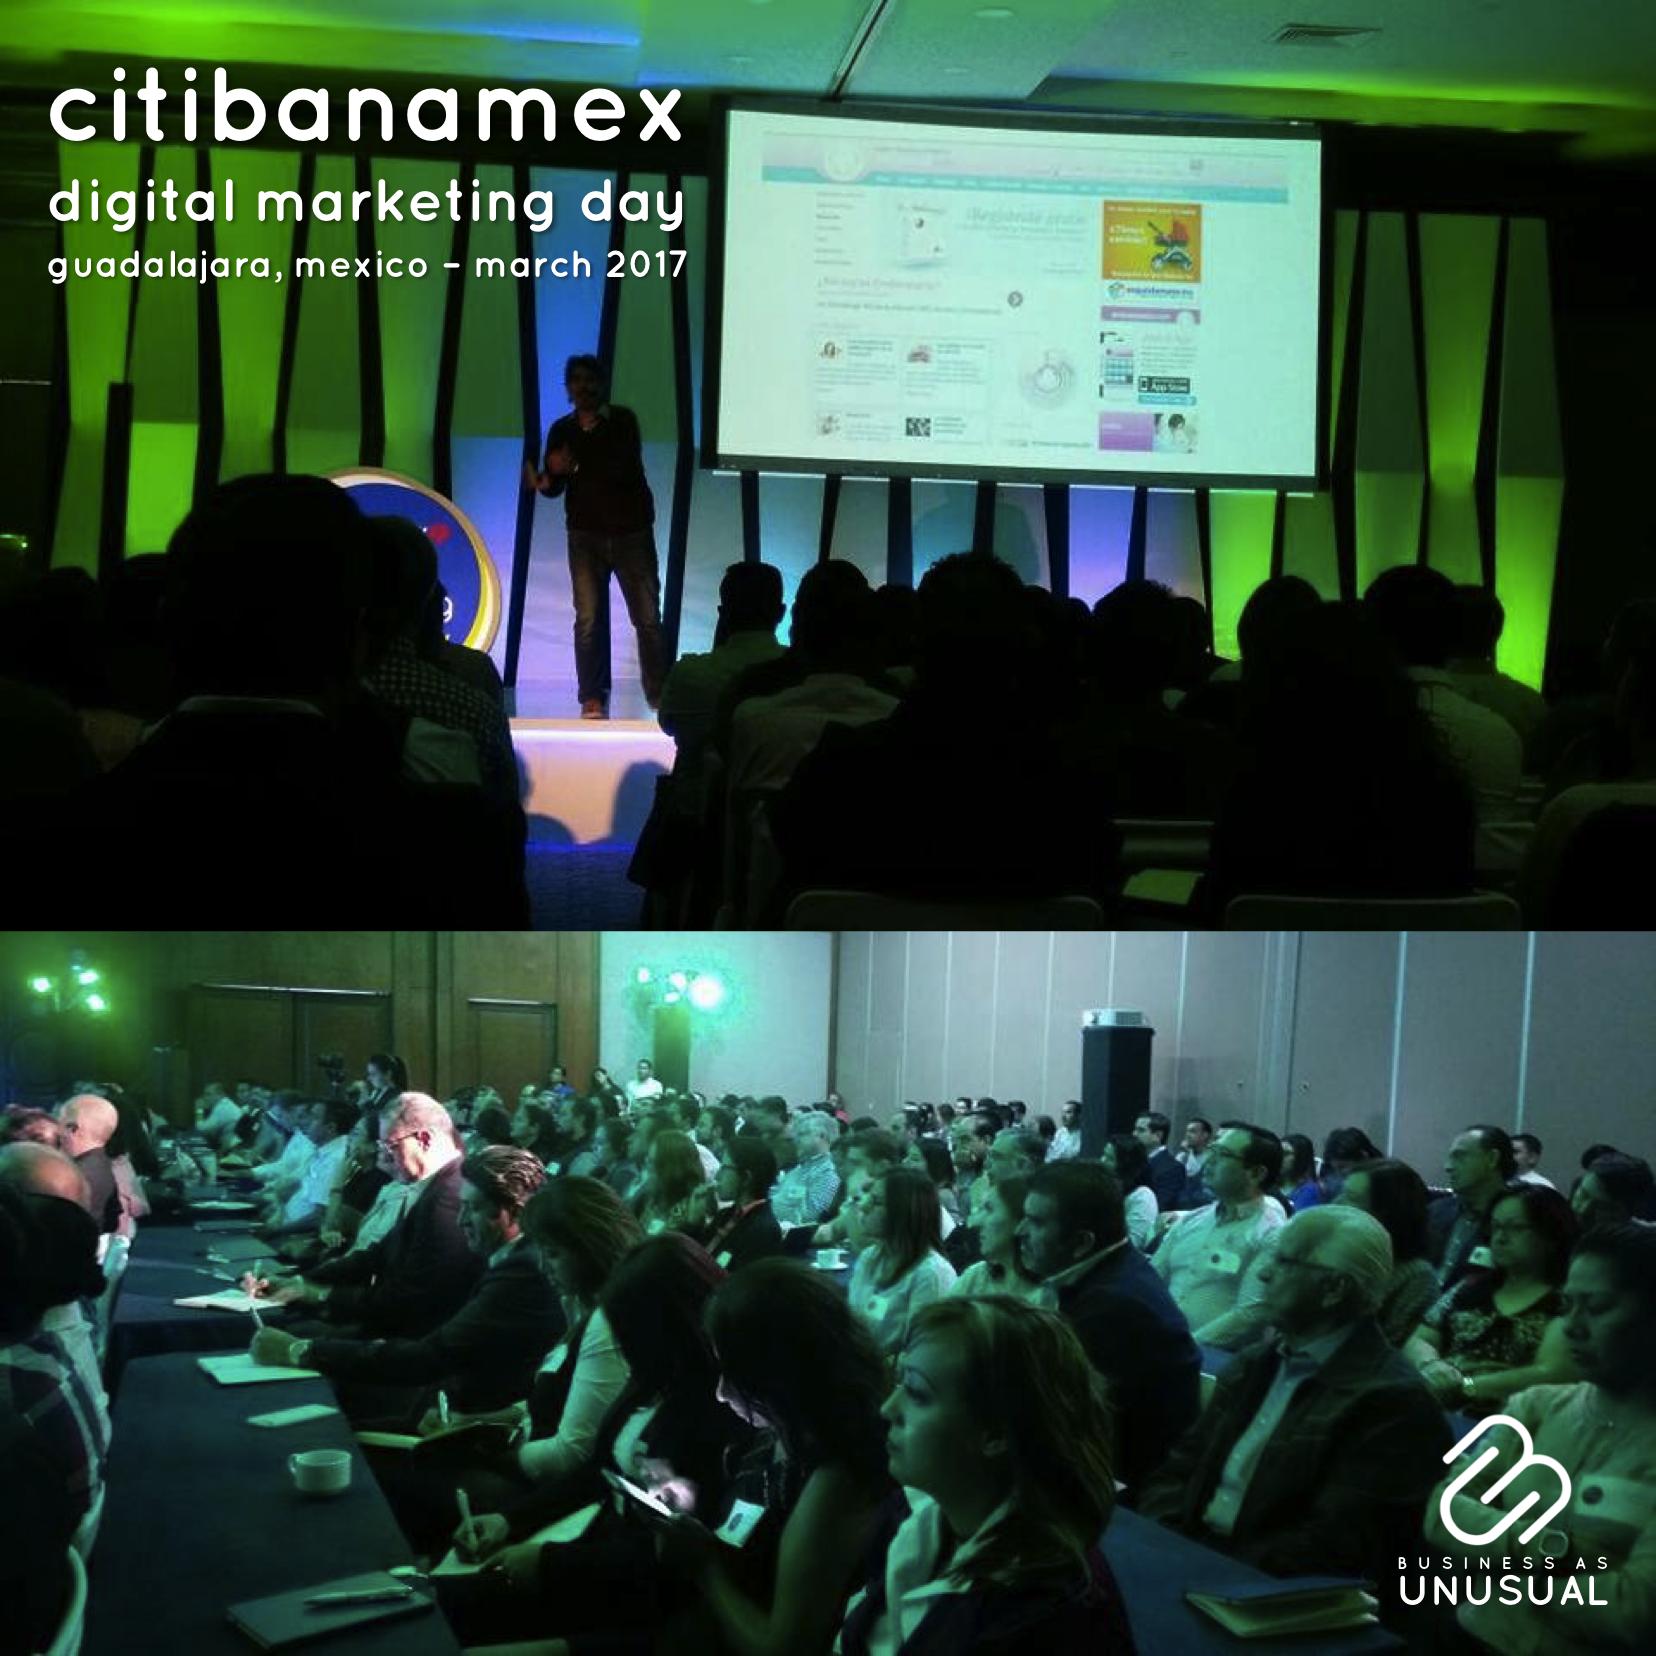 Citibanamex - Digital Marketing Day - Guadalajara